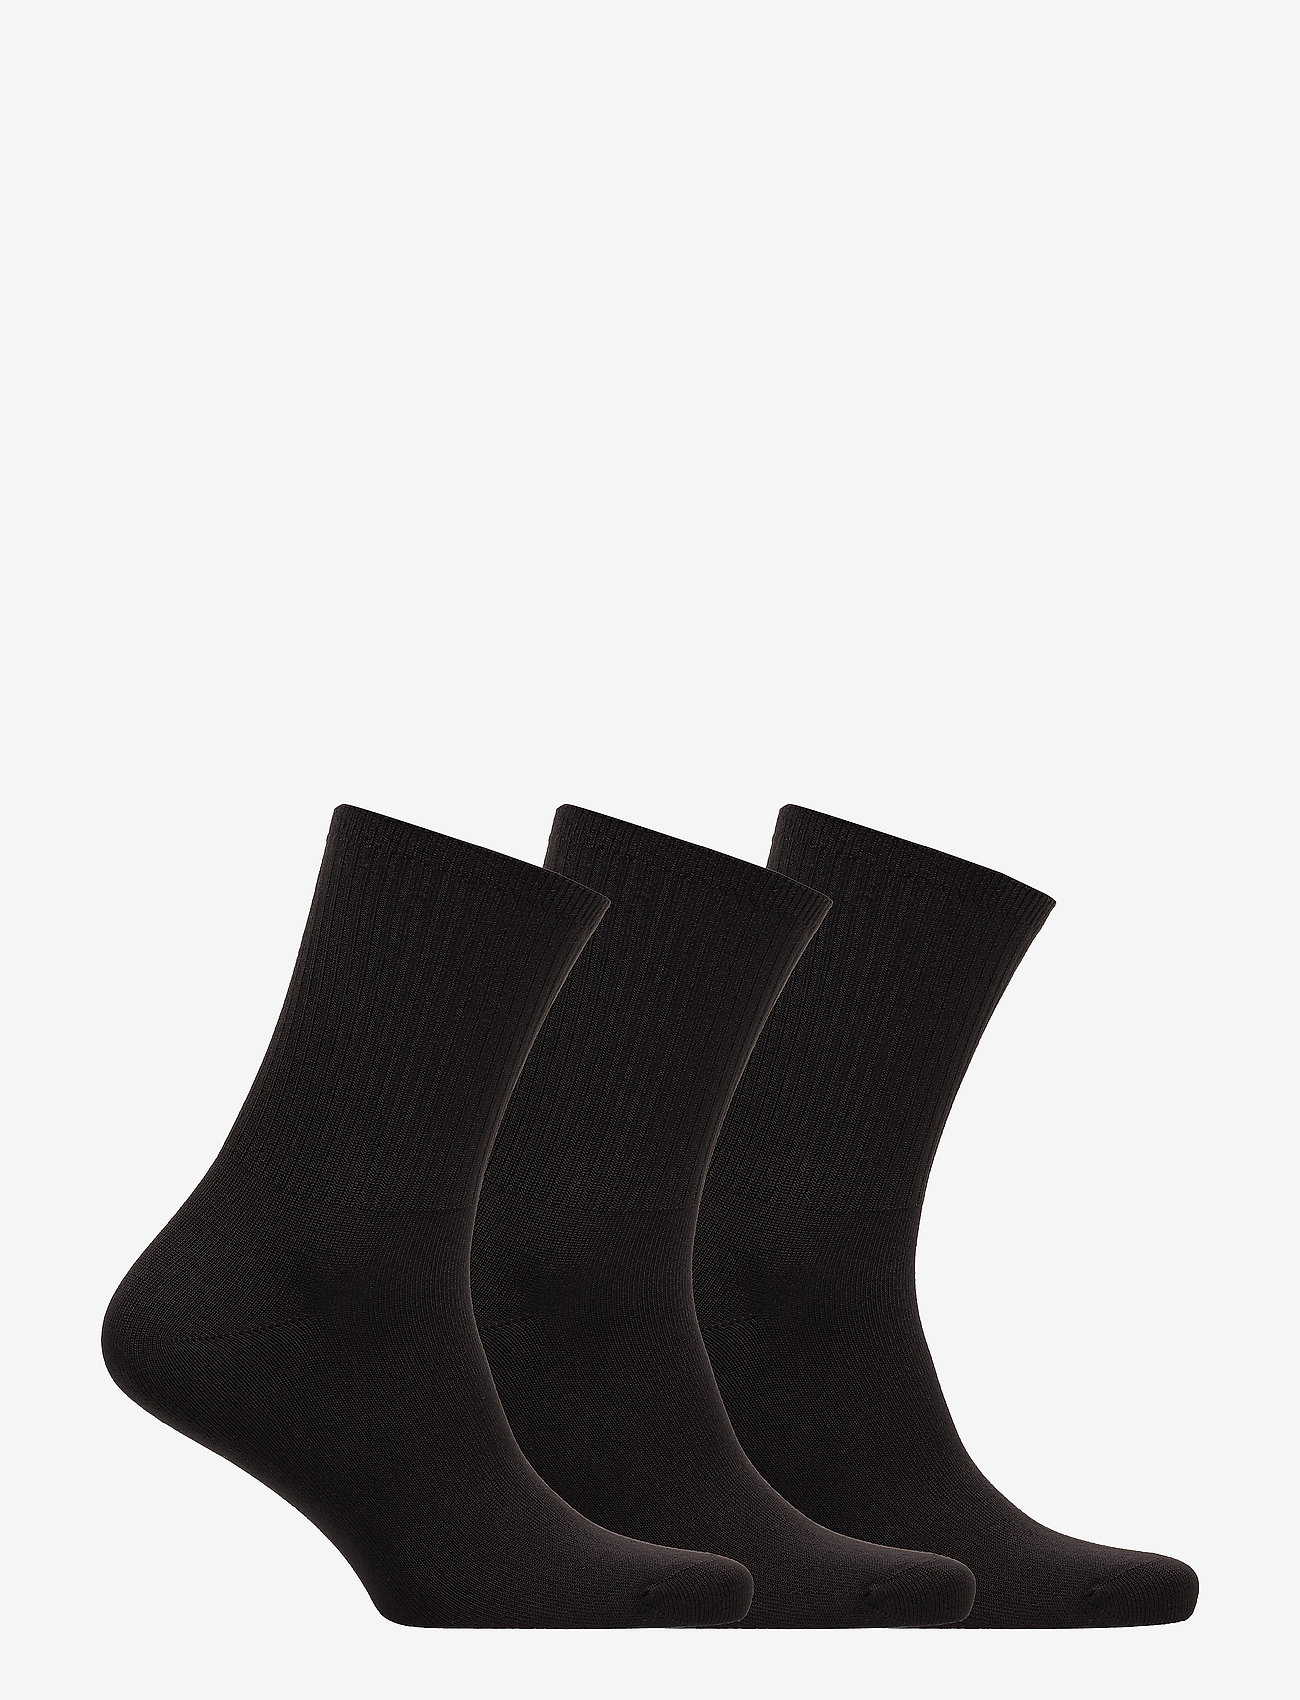 Supersoft Crew Sock 3-pack (Black) - Polo Ralph Lauren xMDeAf